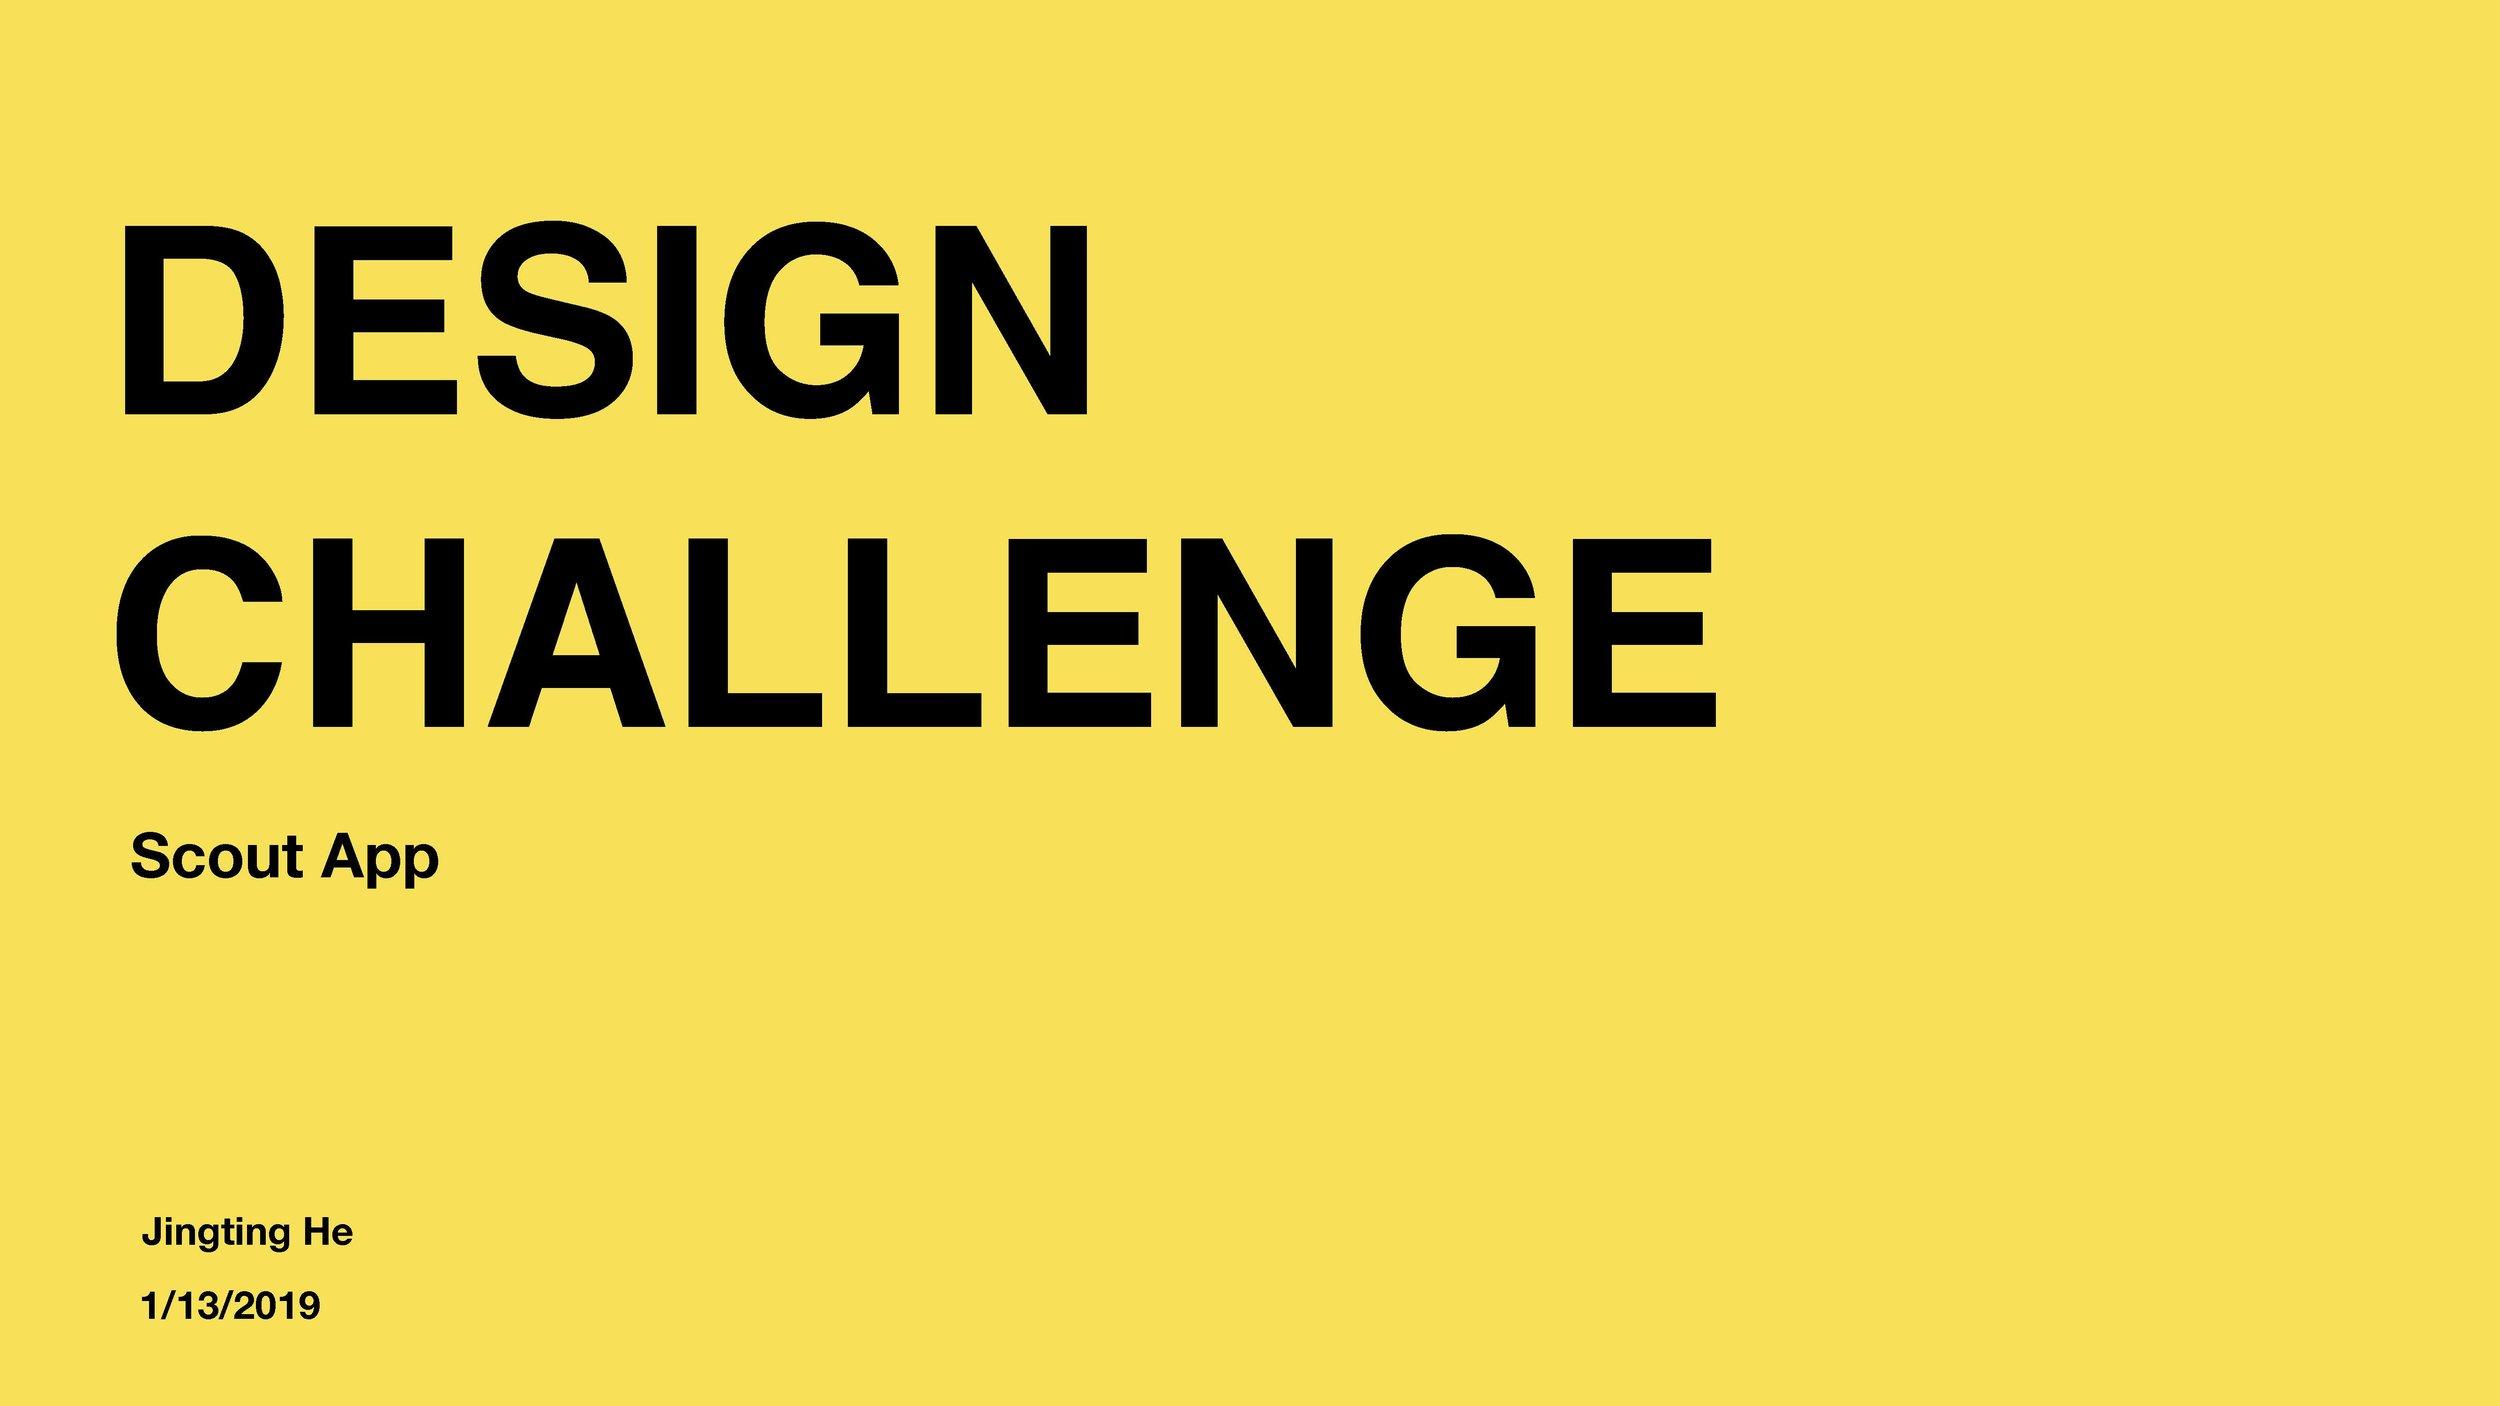 Design Challenge_Scout App_Jingting He_Page_01.jpg